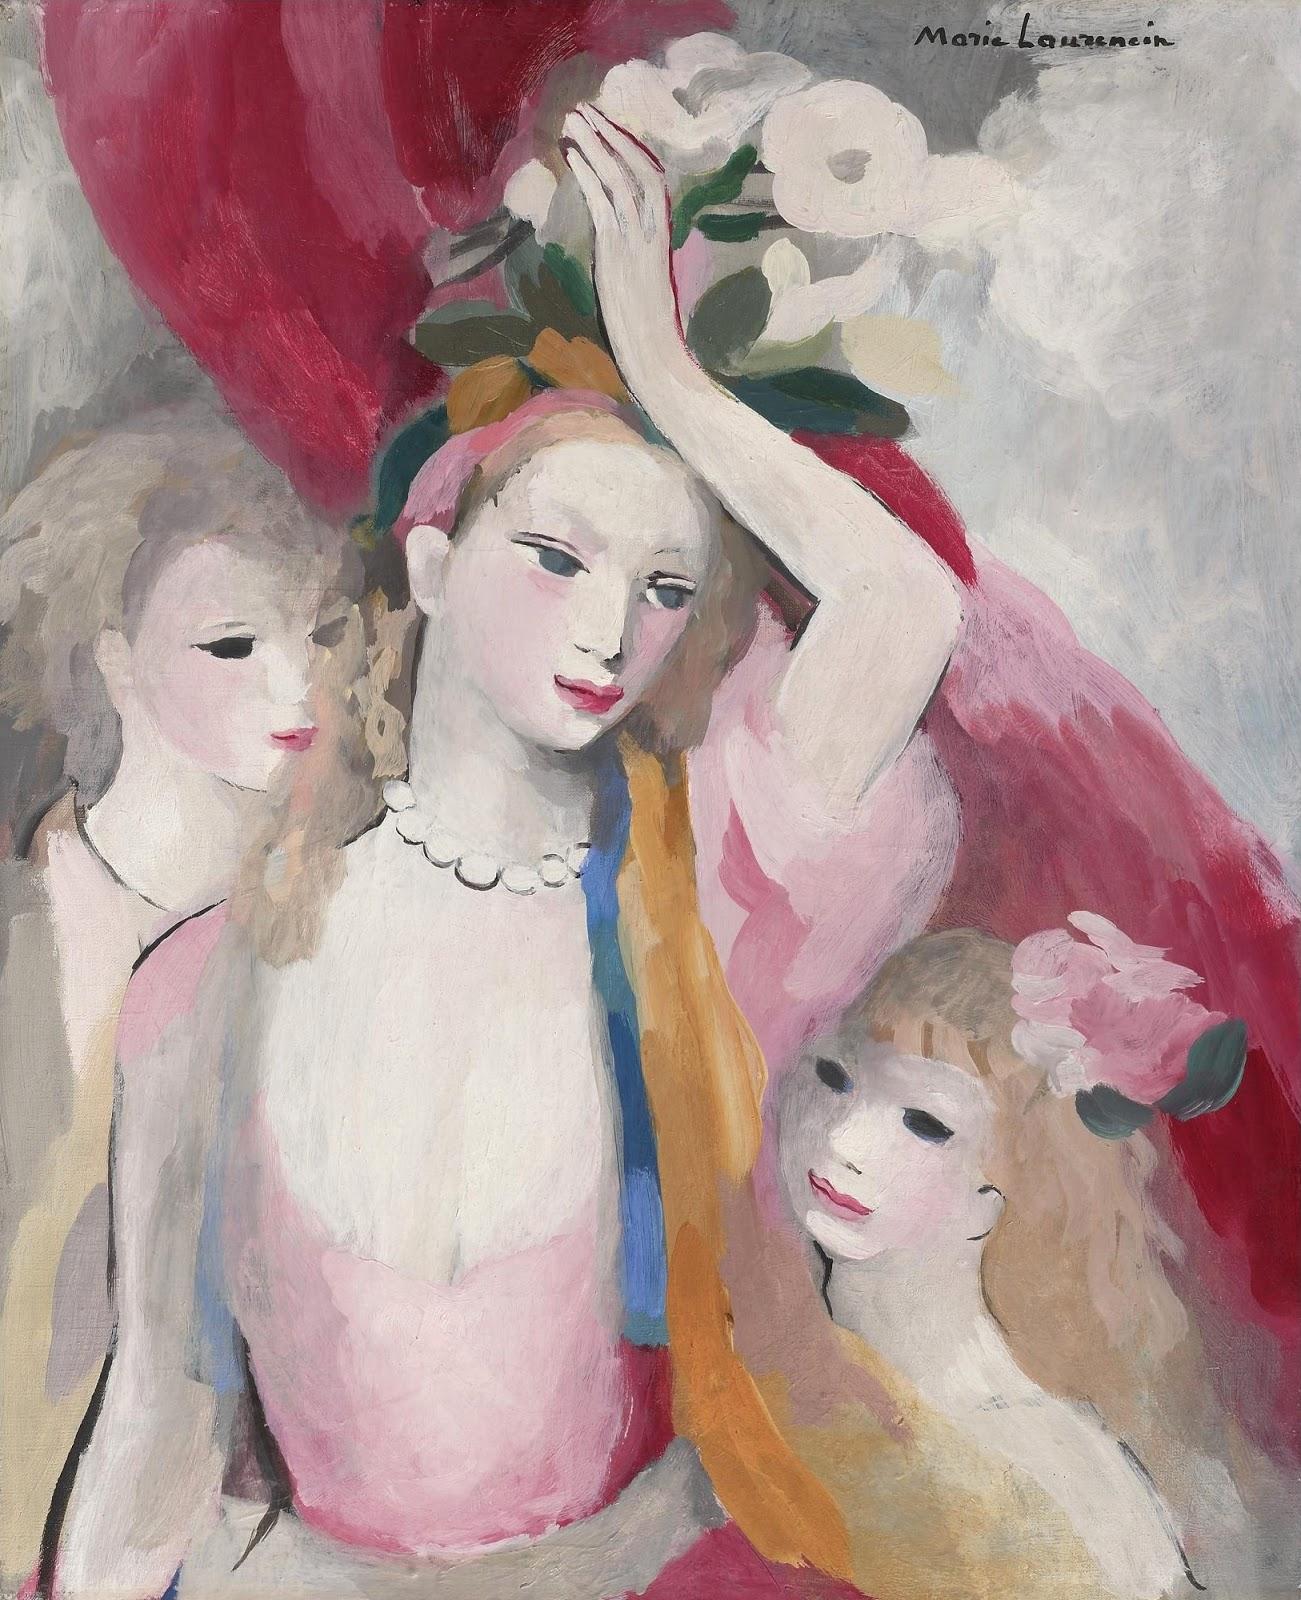 1949_Три девушки (Trois jeunes filles)_61.5 х 50.7_х.,м._Частное собрание.jpg